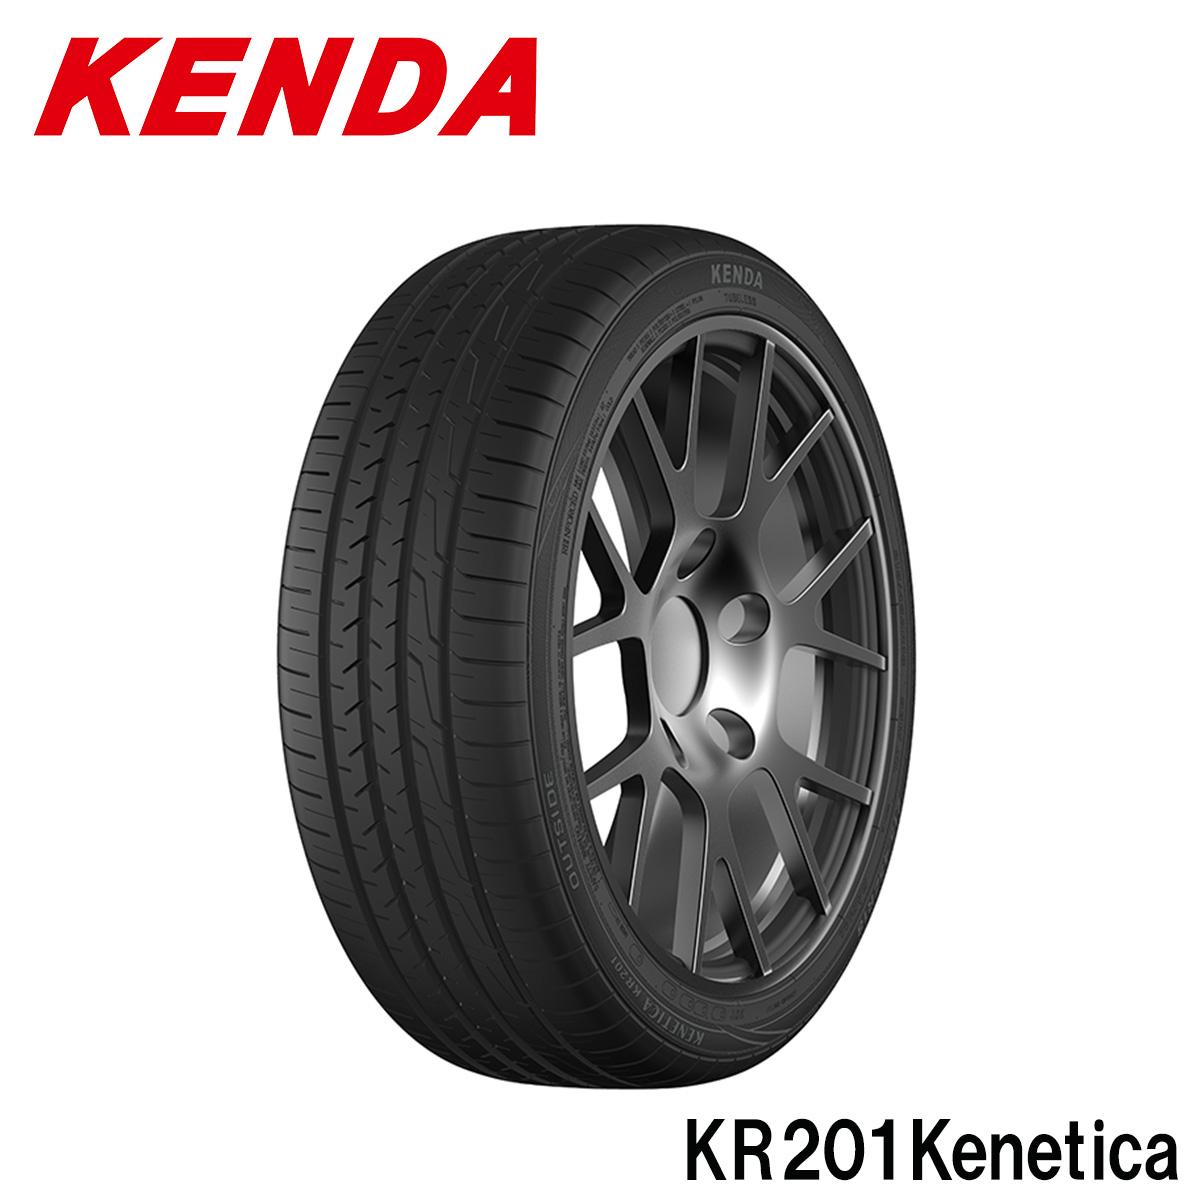 KENDA ケンダ ミニバン タイア 2本 18インチ 215/55R18 KR201 Kenetica